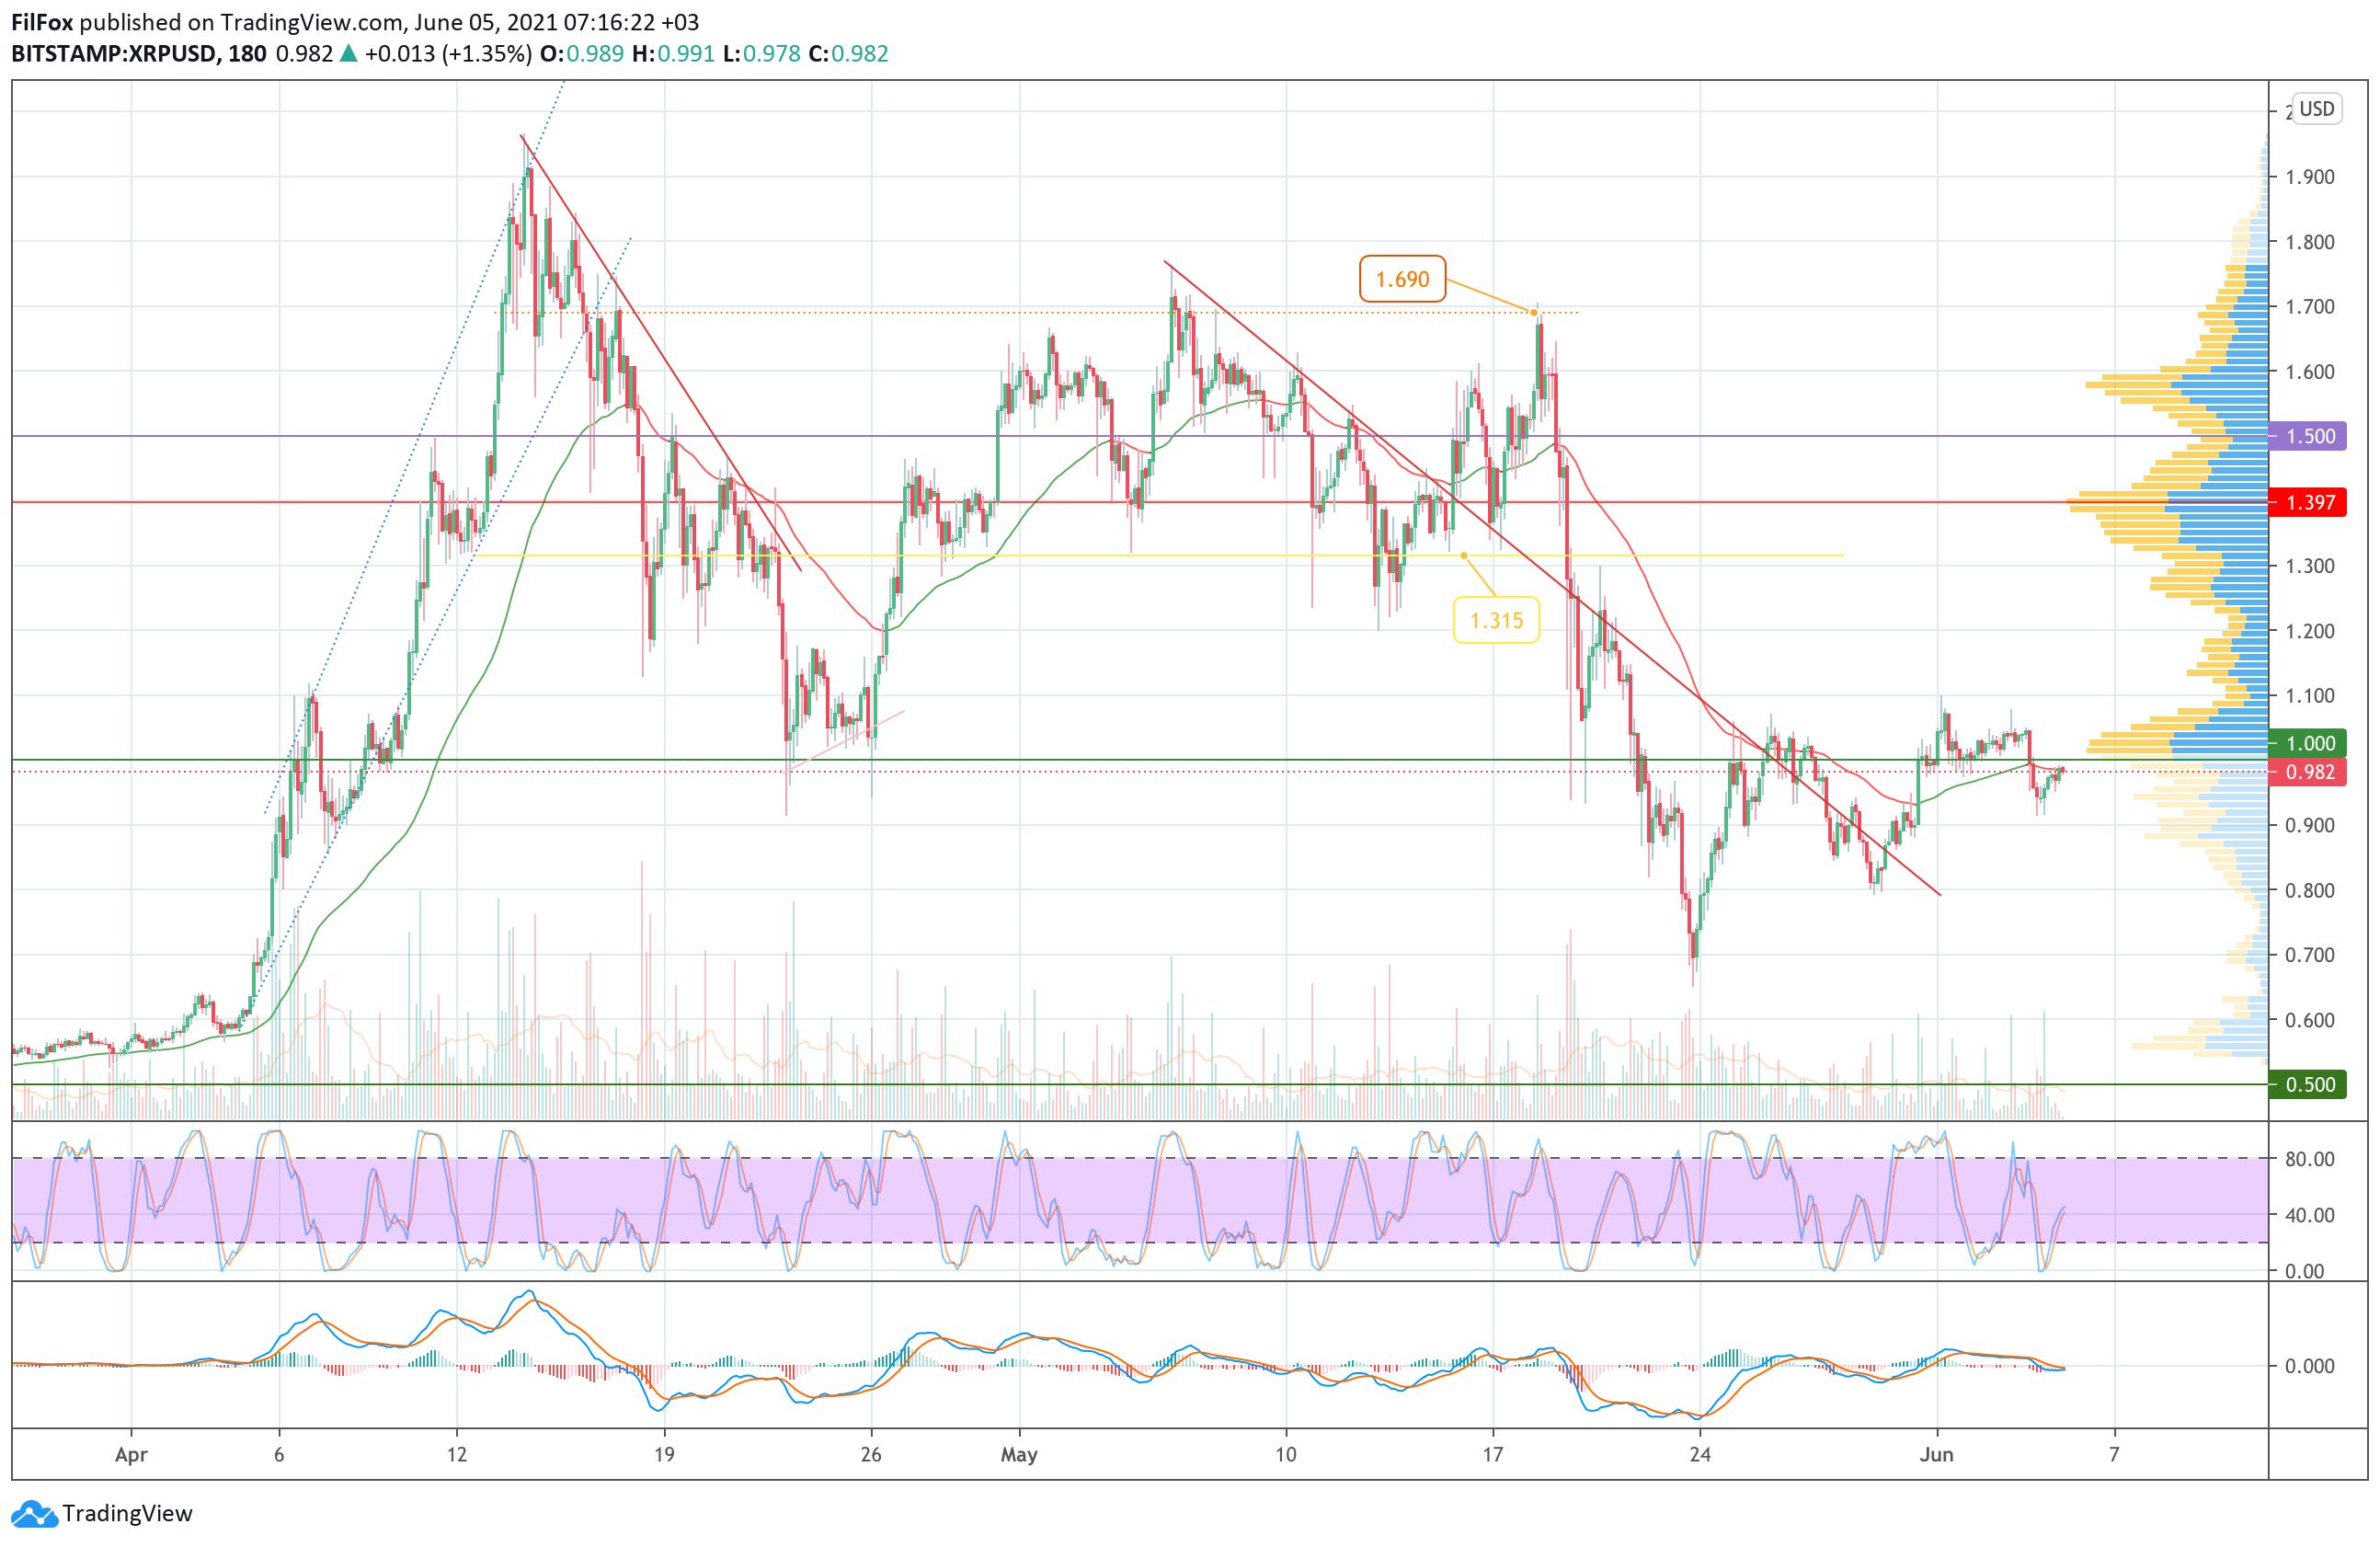 Анализ цен Bitcoin, Ethereum, XRP на 05.06.2021